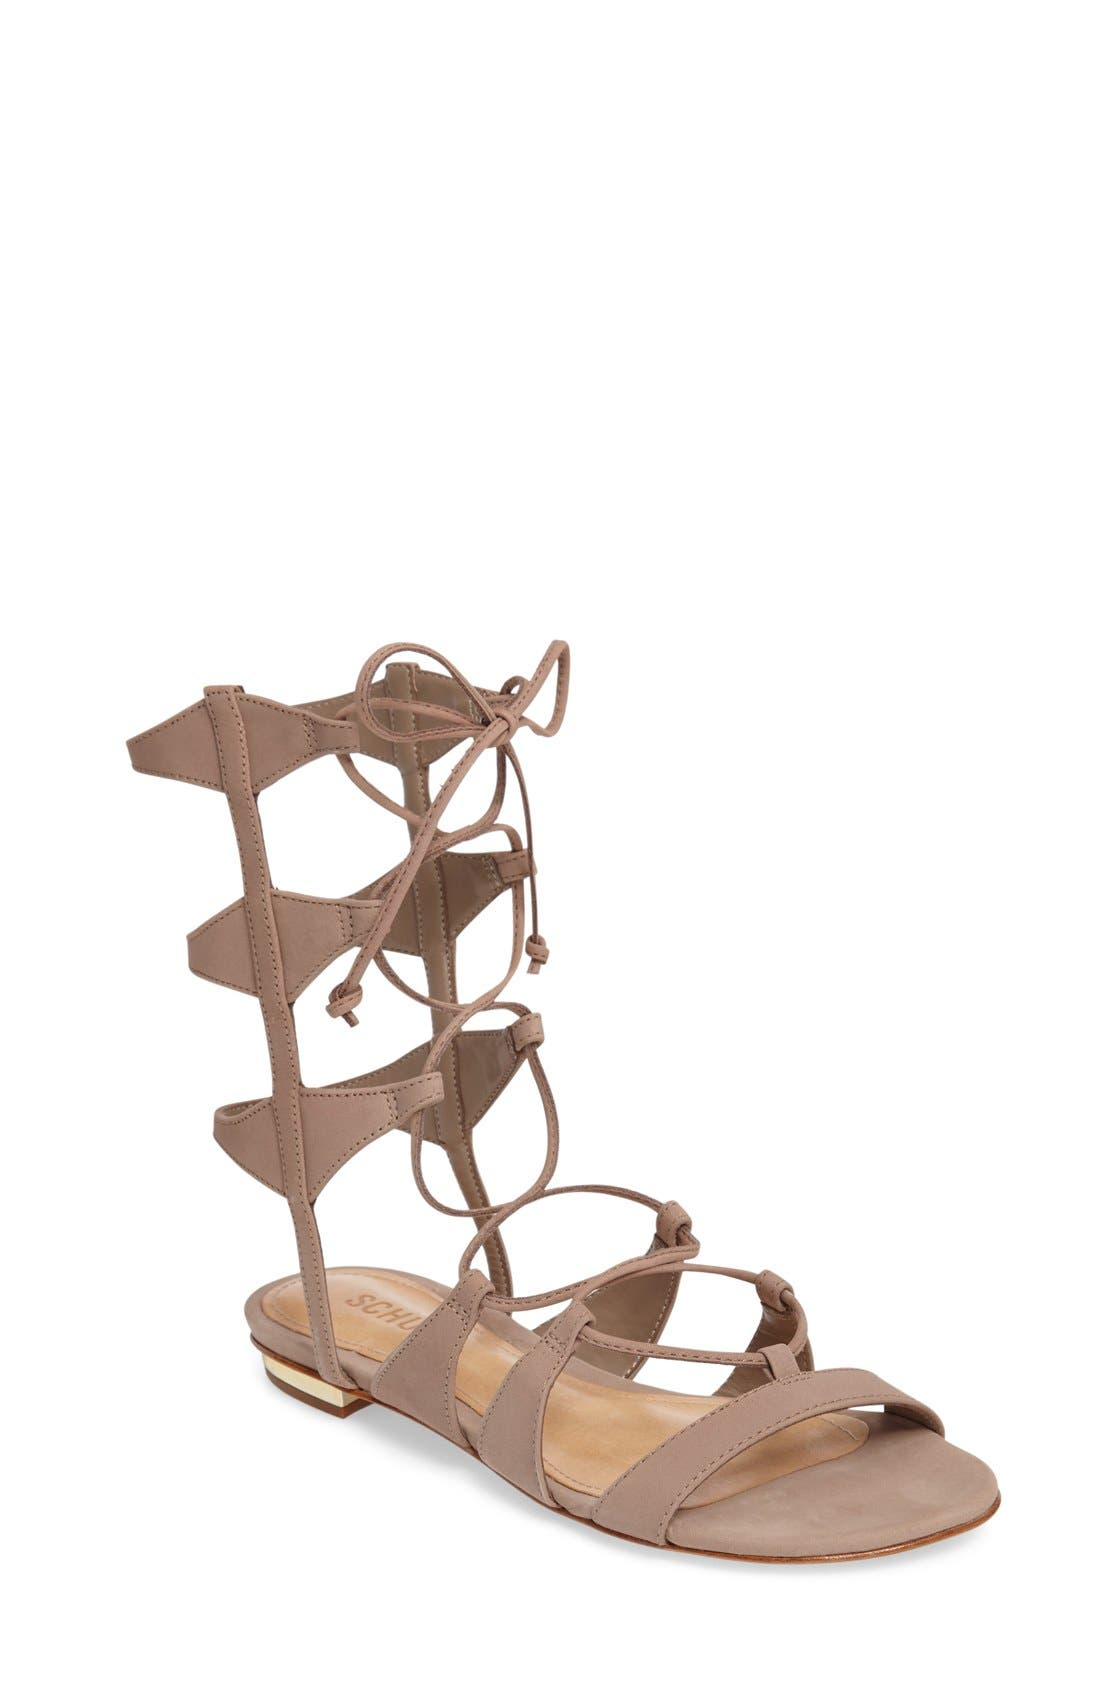 Main Image - Schutz Erlina Lace-Up Sandal (Women)